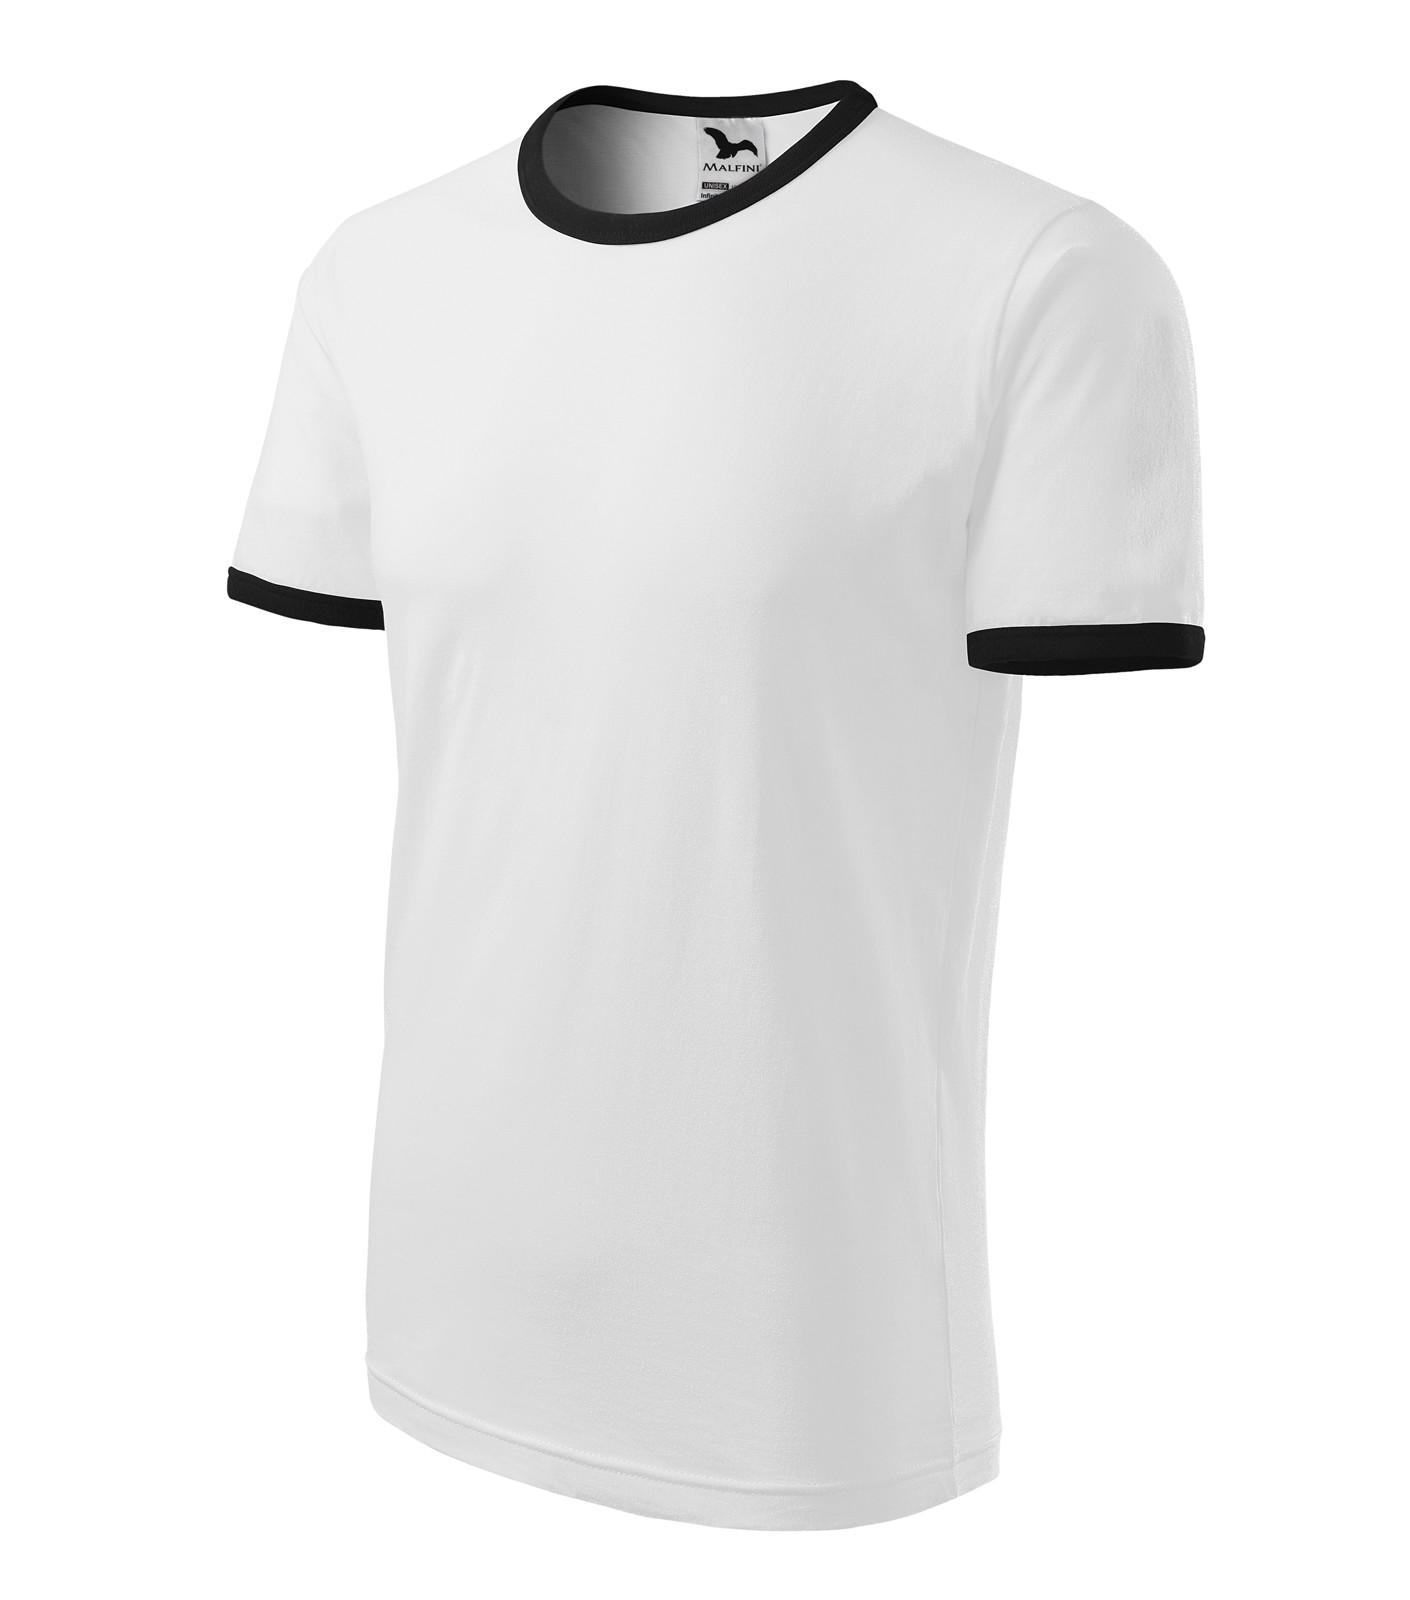 Tričko unisex Malfini Infinity - Bílá / 2XL